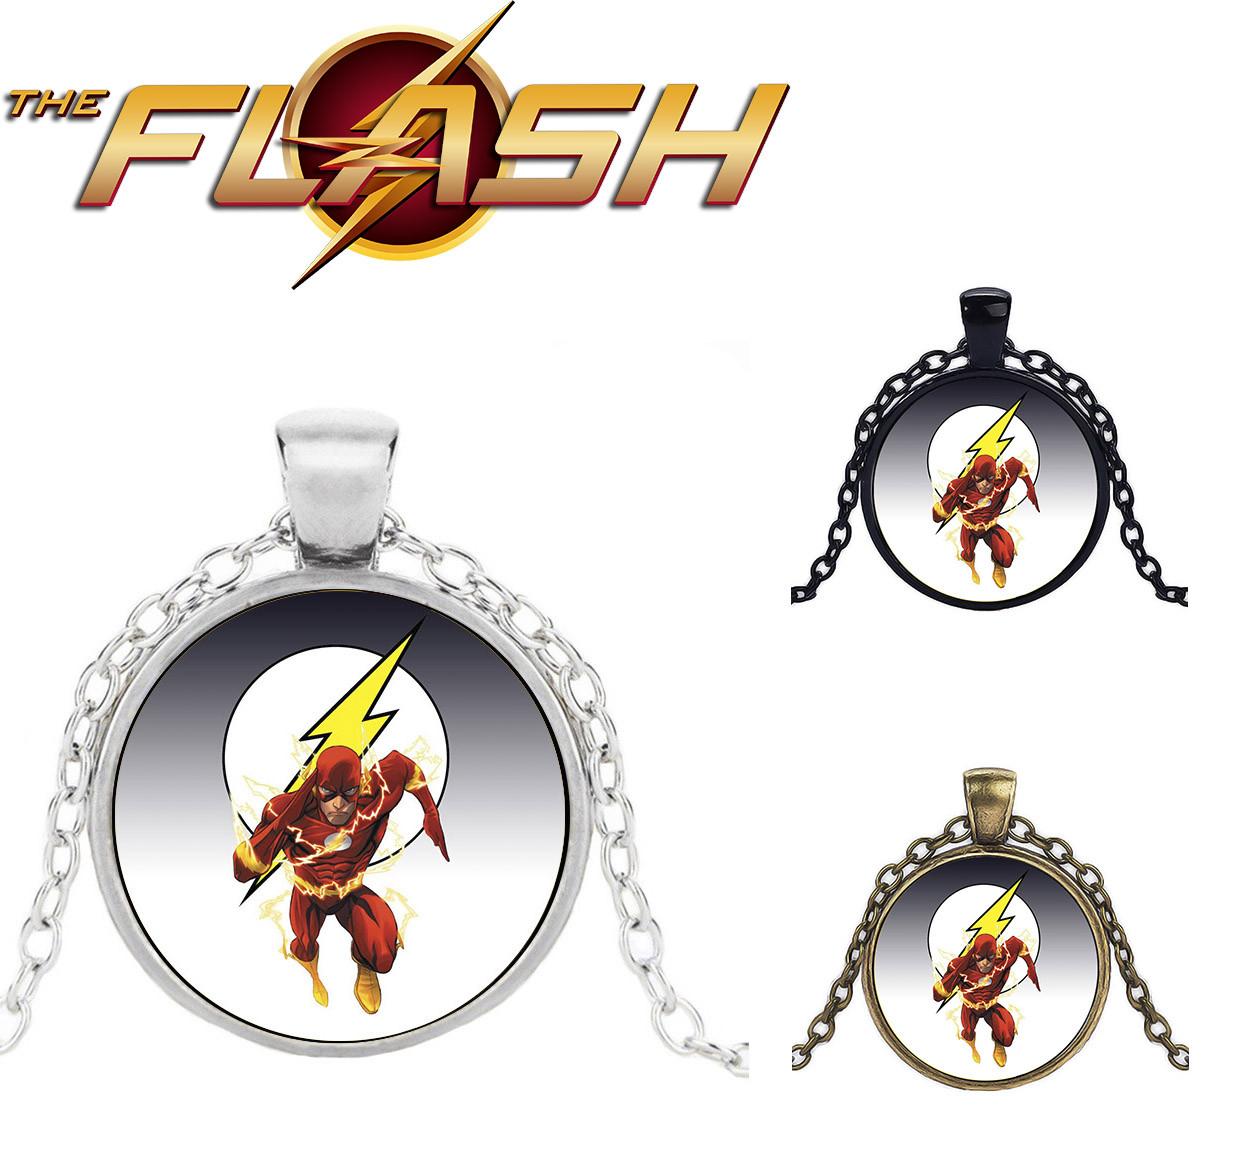 Кулон с изображением супергероя и логотипа Flash Флэш DC комиксы